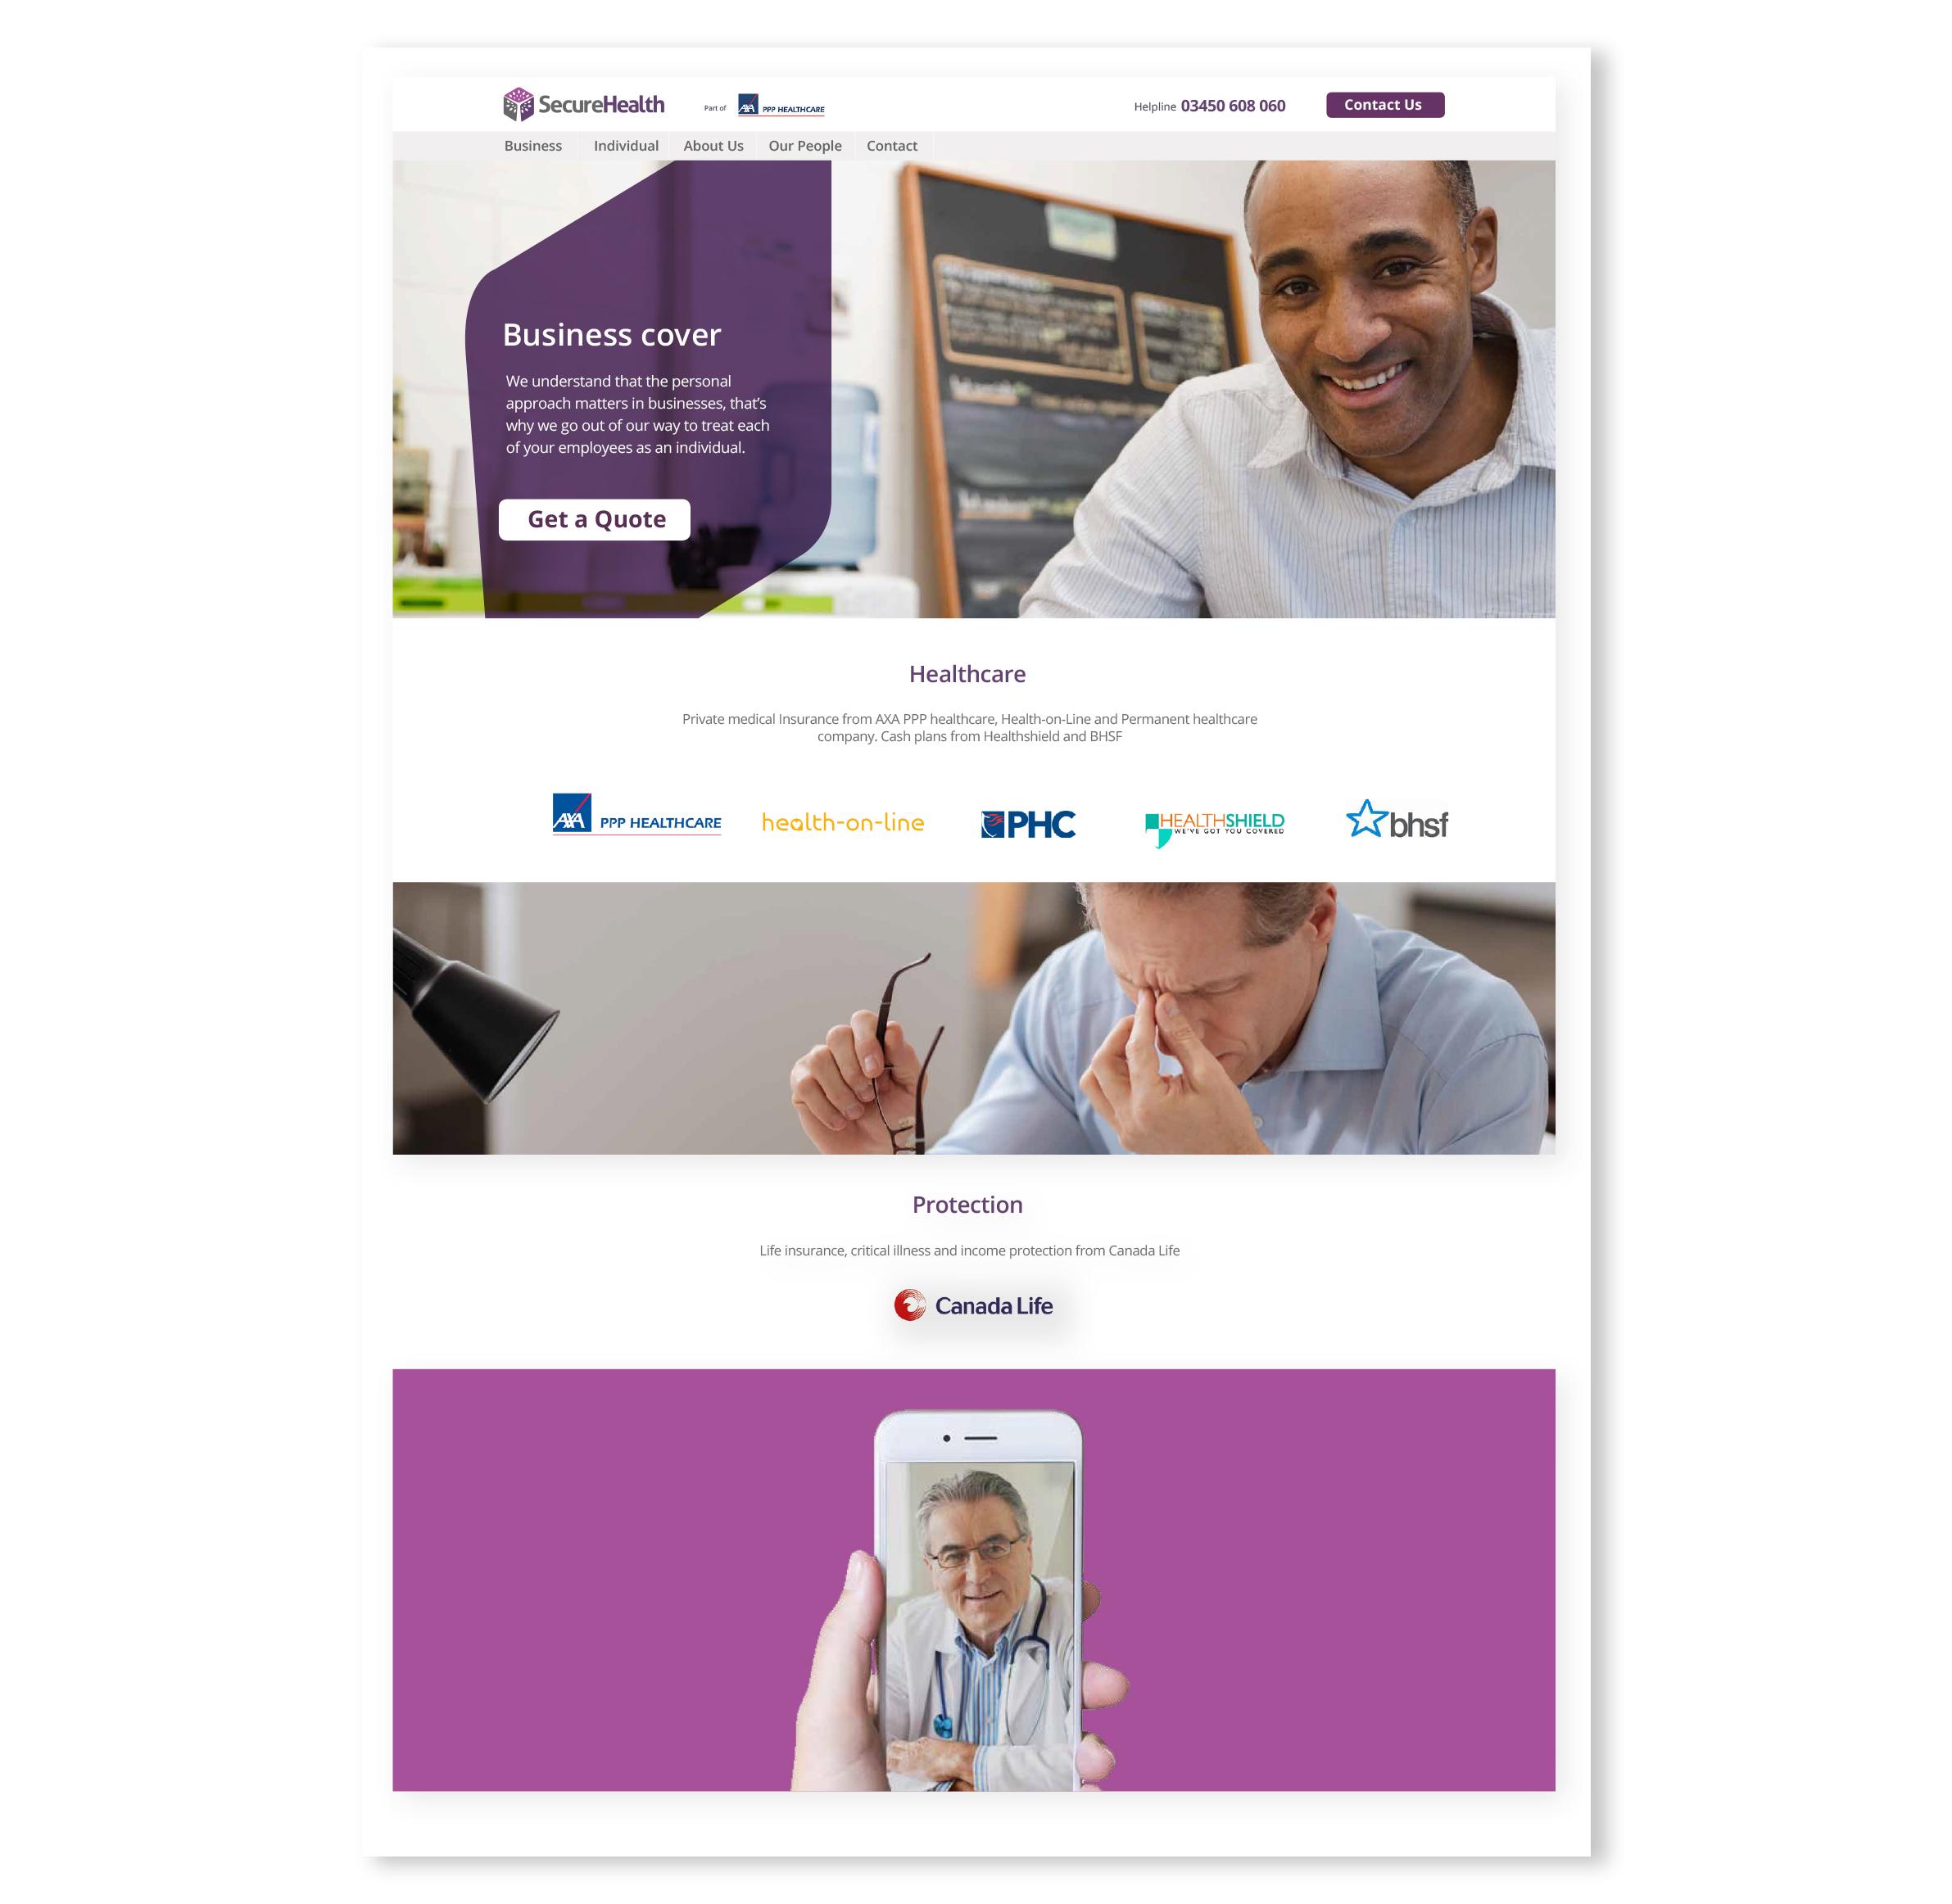 Secure Health Website Image Case Study